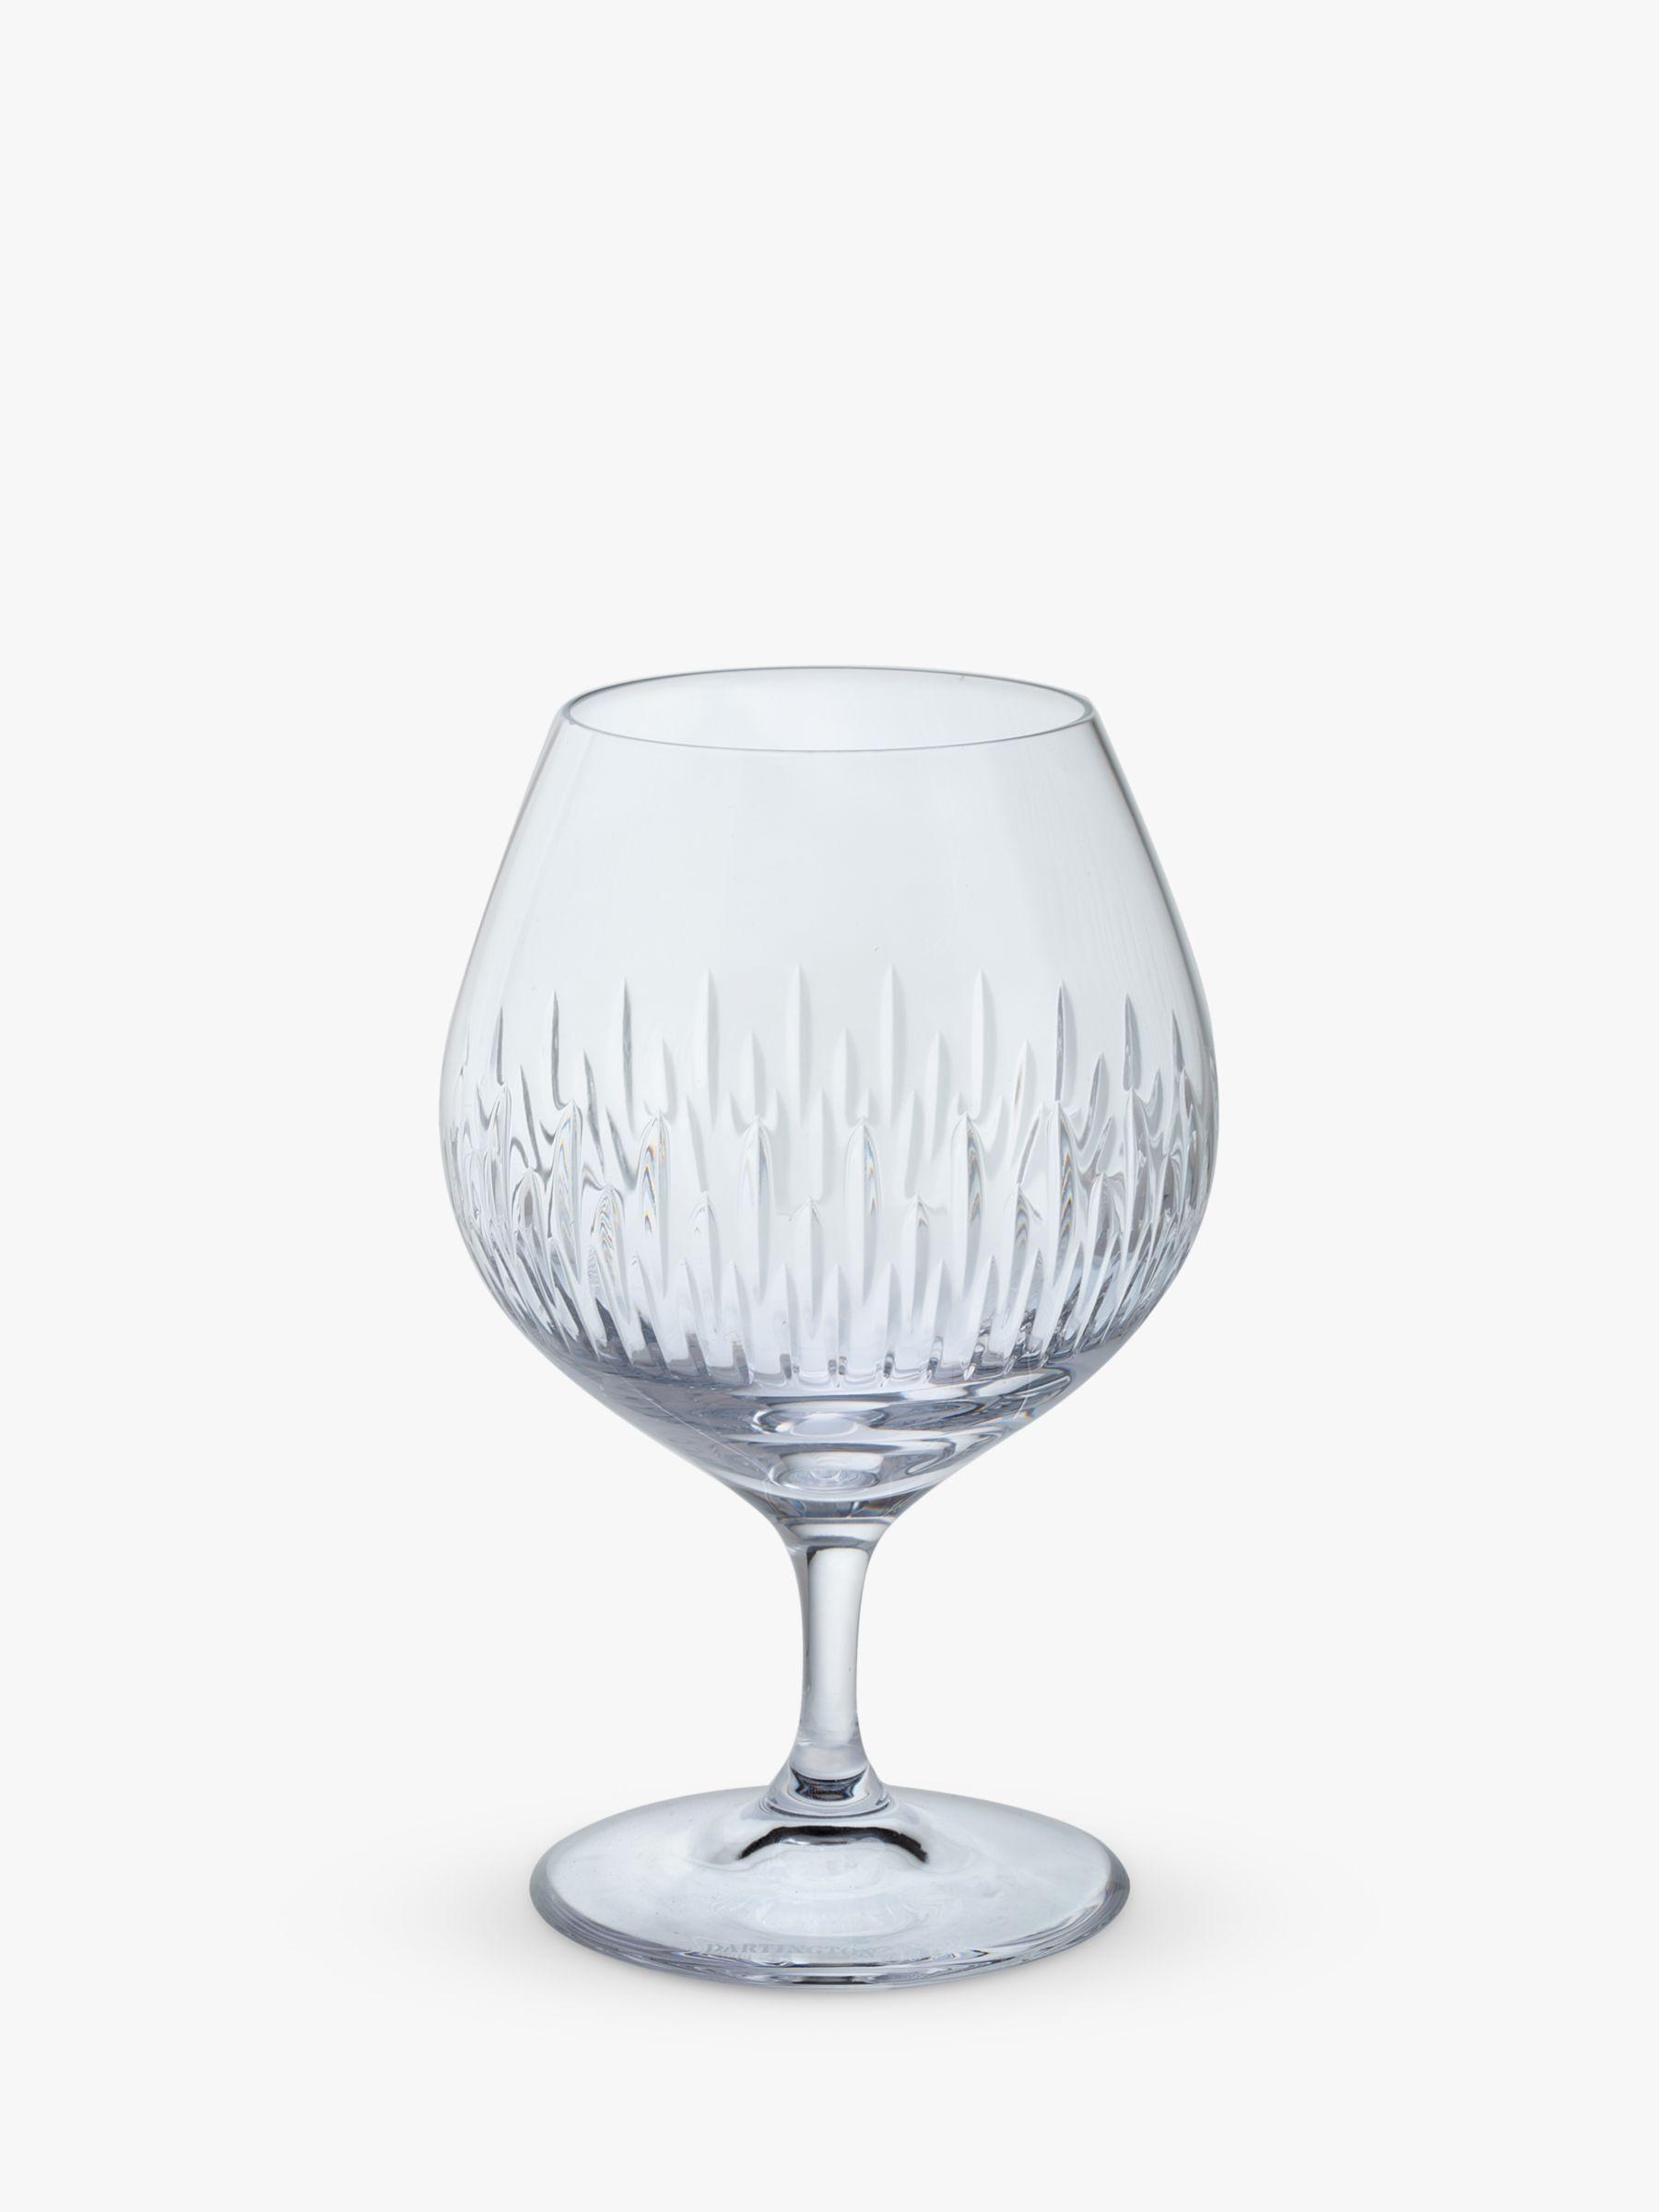 Dartington Crystal Dartington Crystal Limelight Cut Glass Brandy Glasses, 400ml, Set of 2, Clear